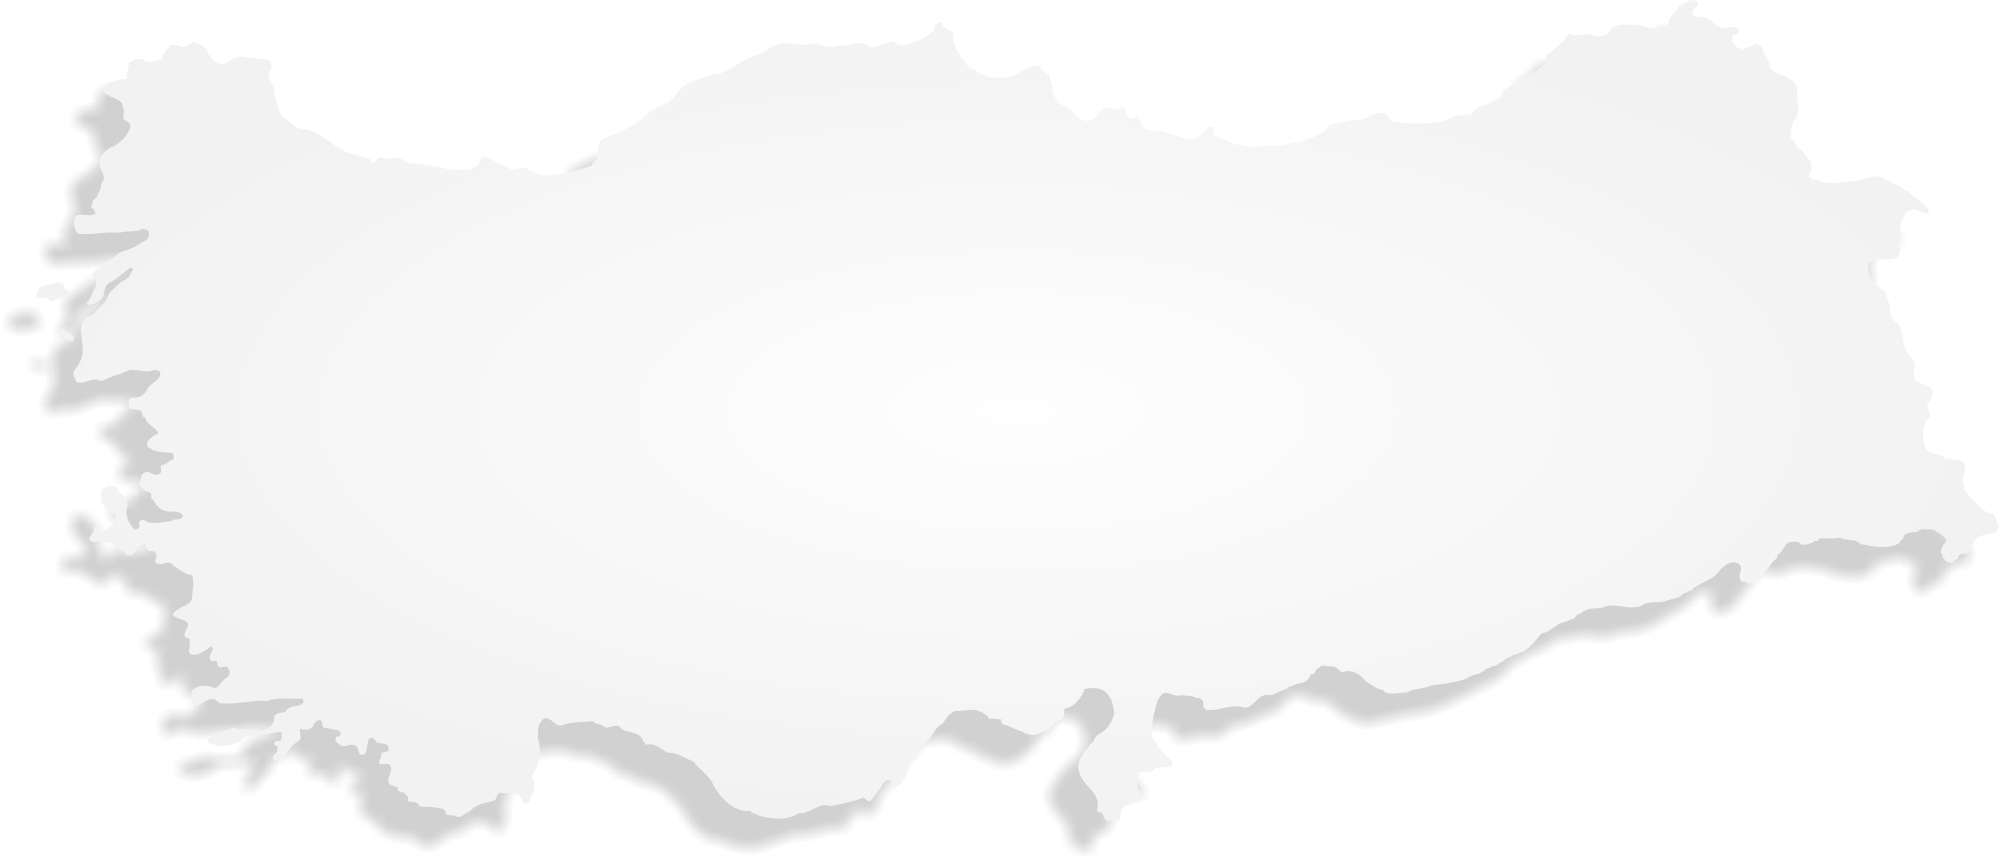 navimex bayi haritası